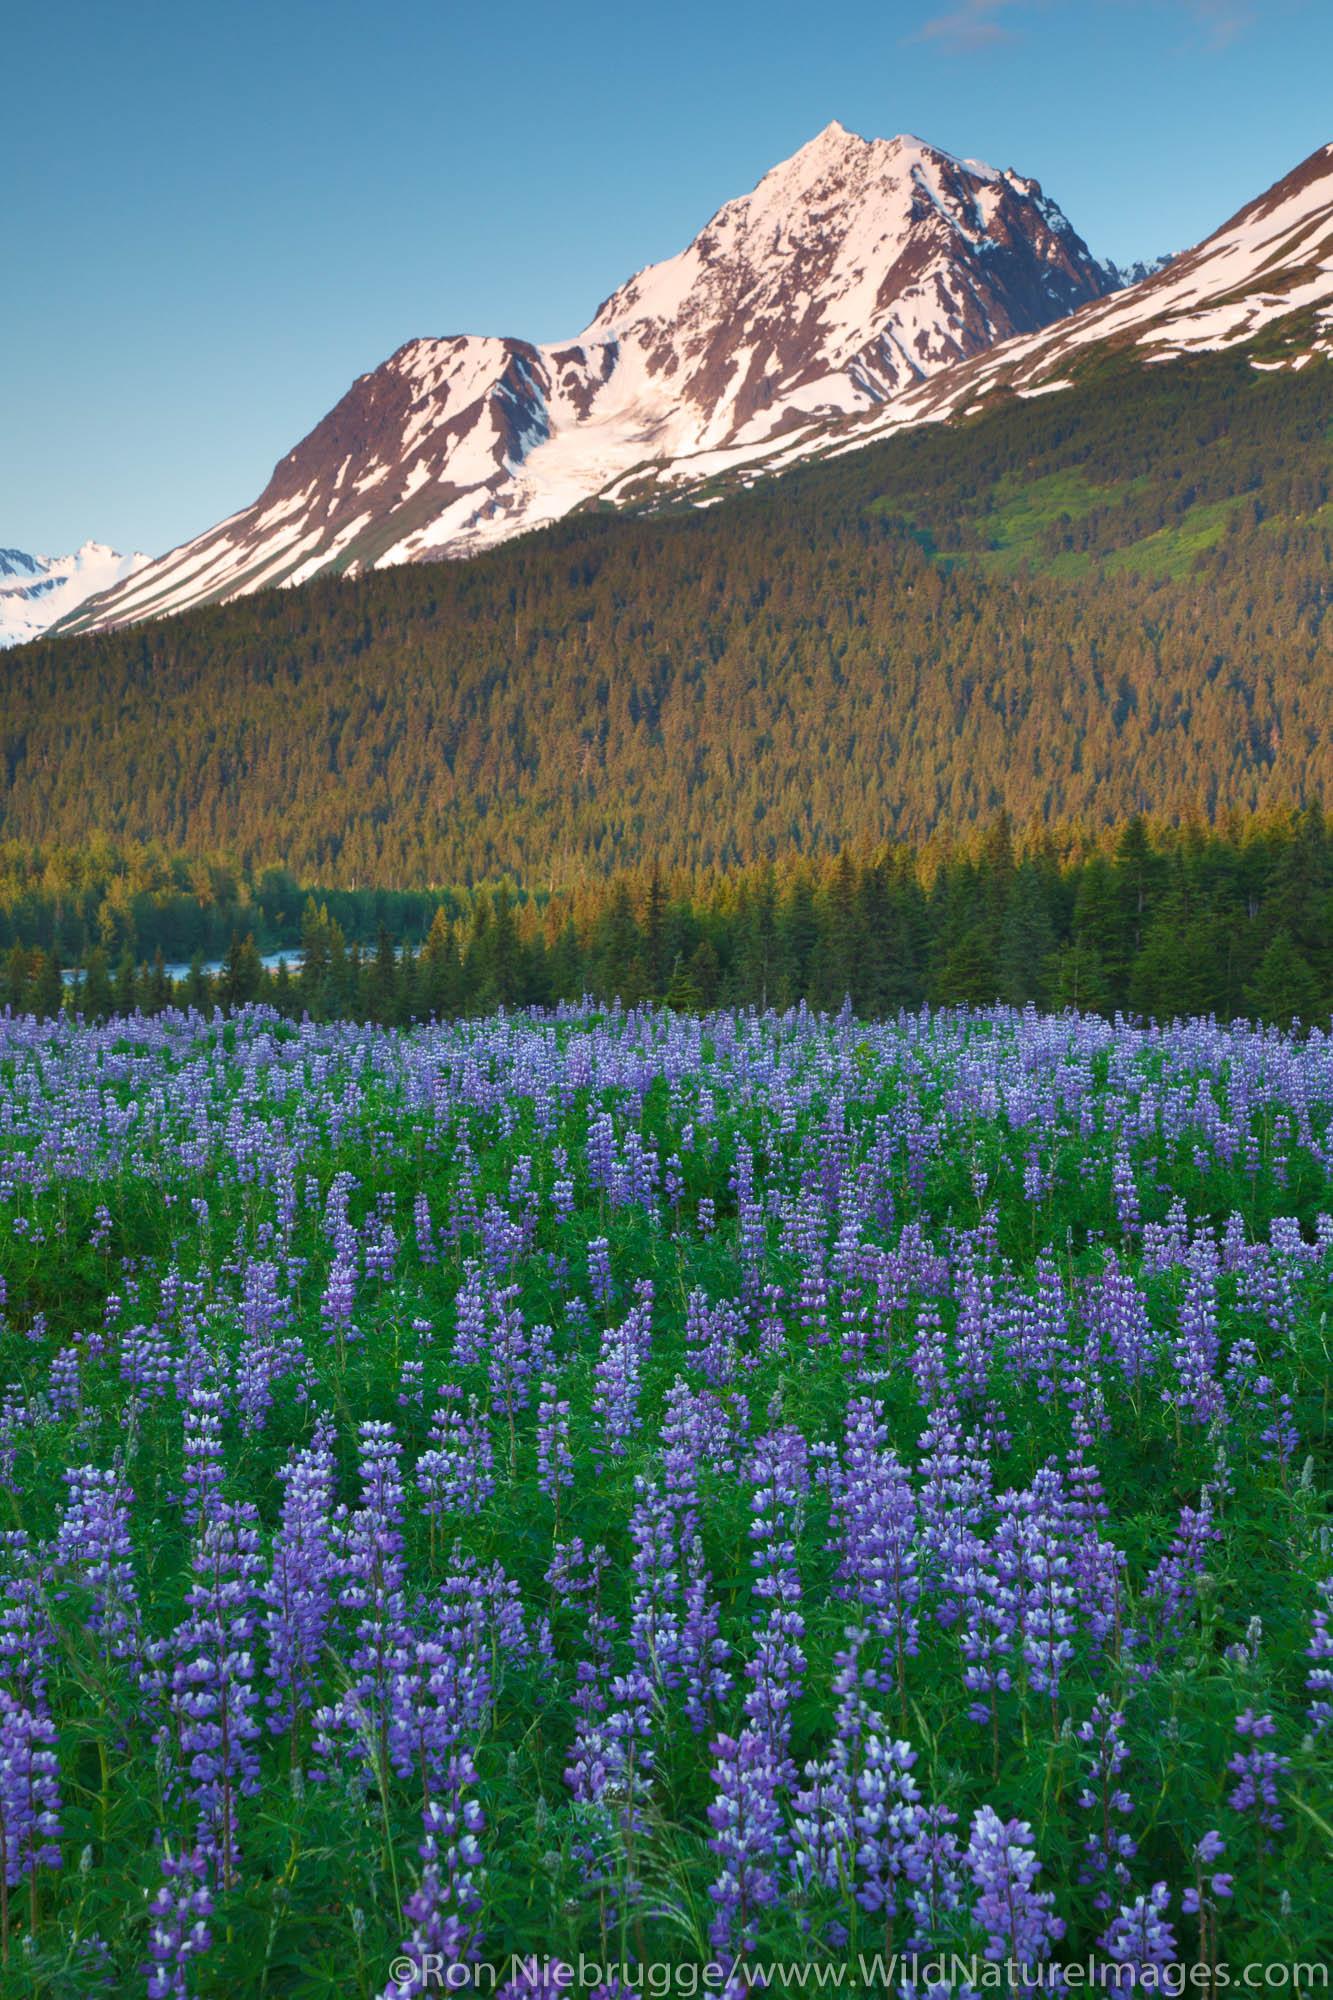 Field of lupine, Chugach National Forest, Alaska.